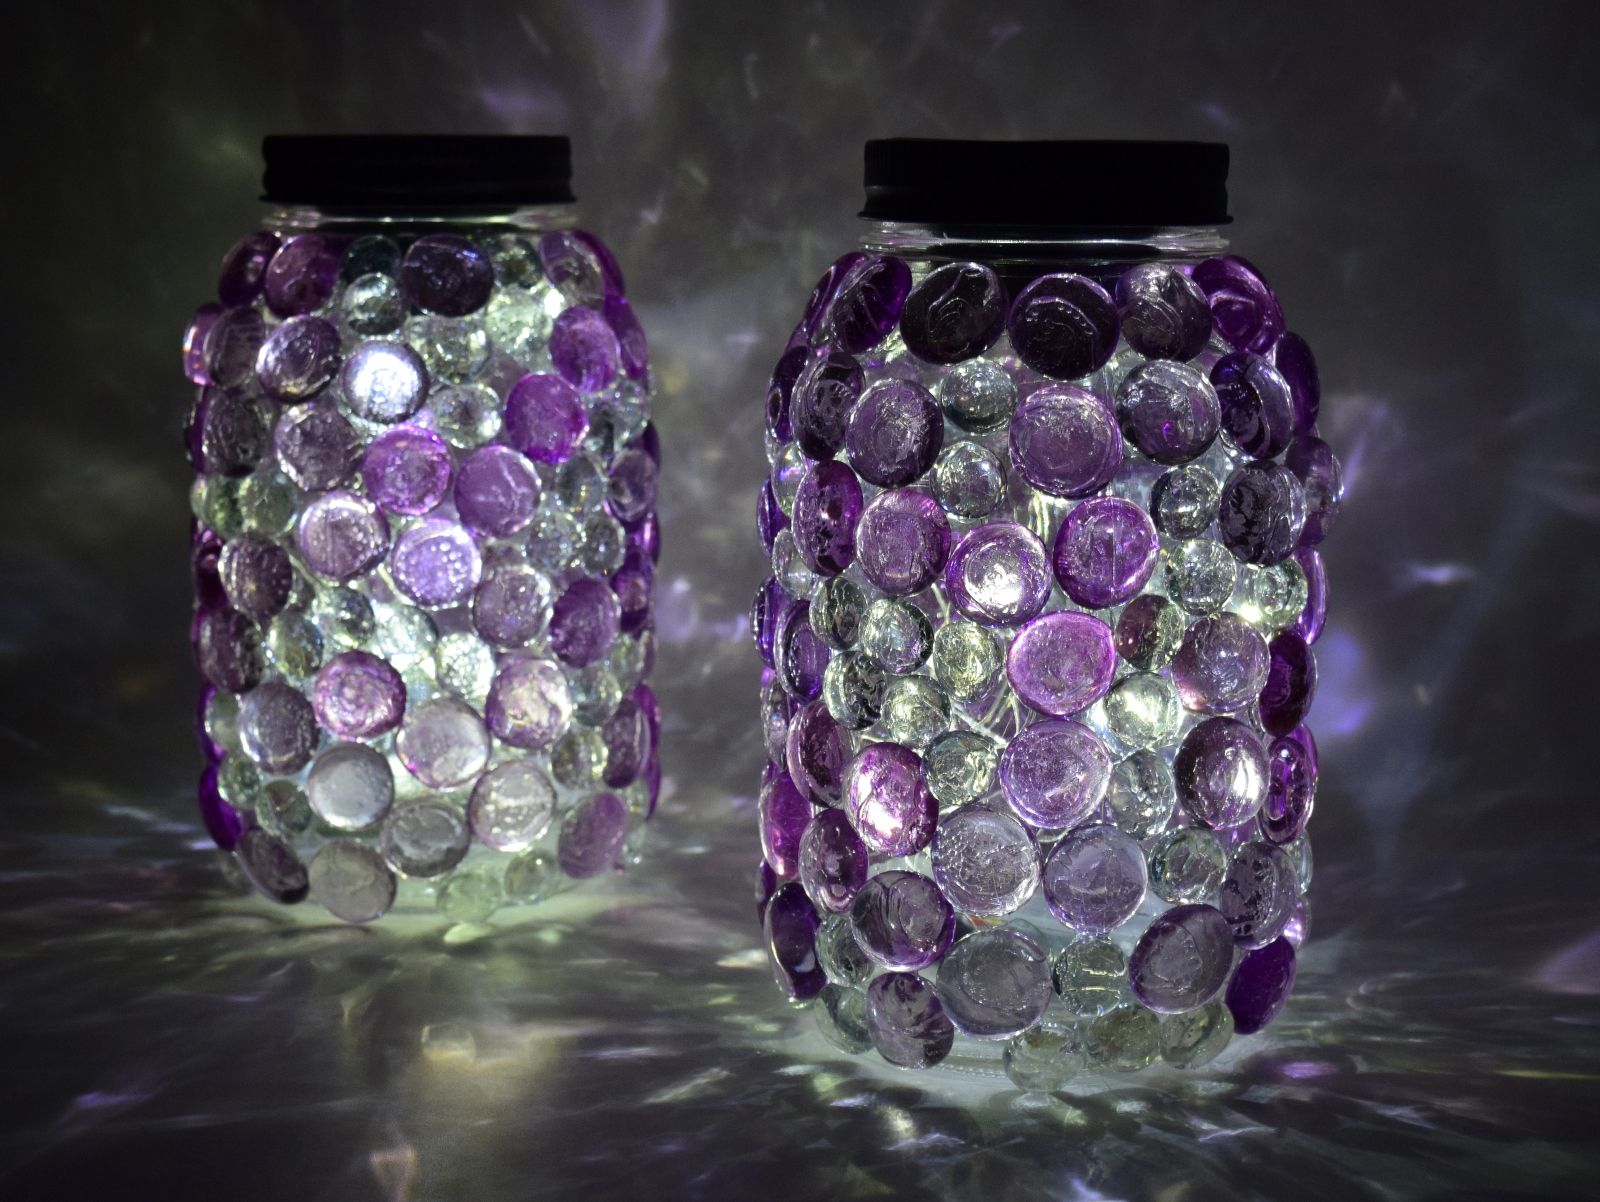 Aleene's Glue Products | Craft & DIY Project Adhesives - Glittering Gem Mason Jars Lights